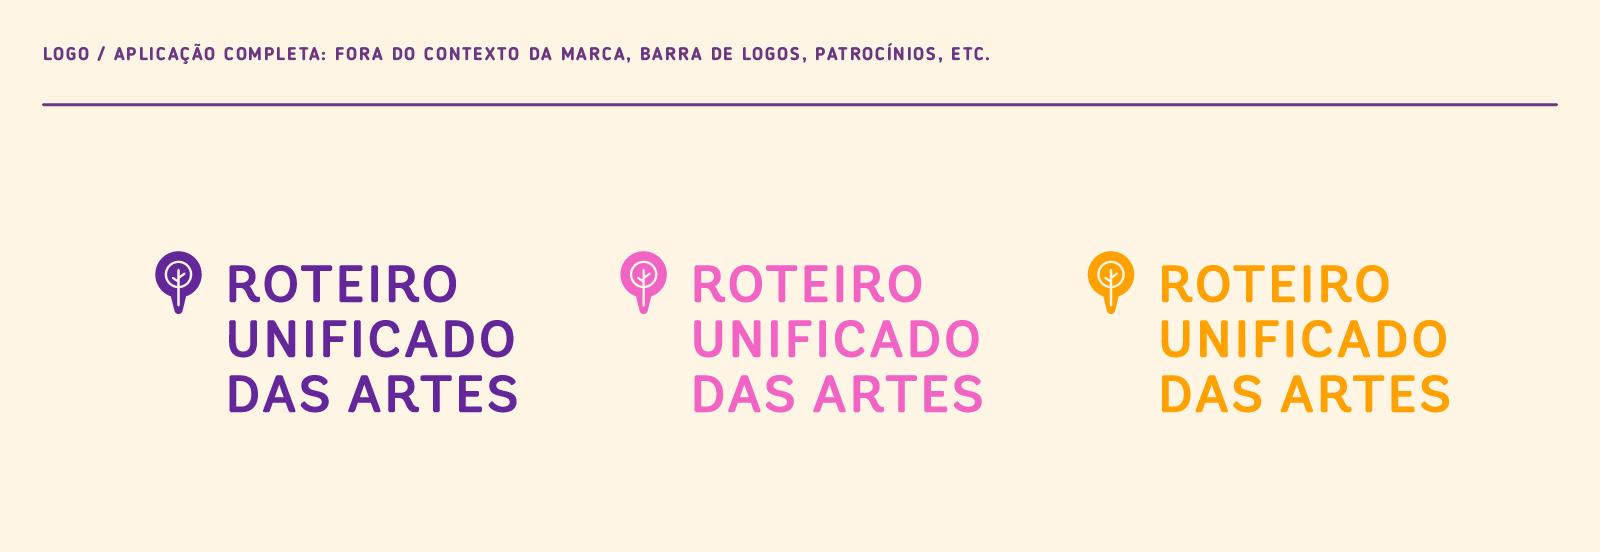 05_Rua_Behance_Logo Completa